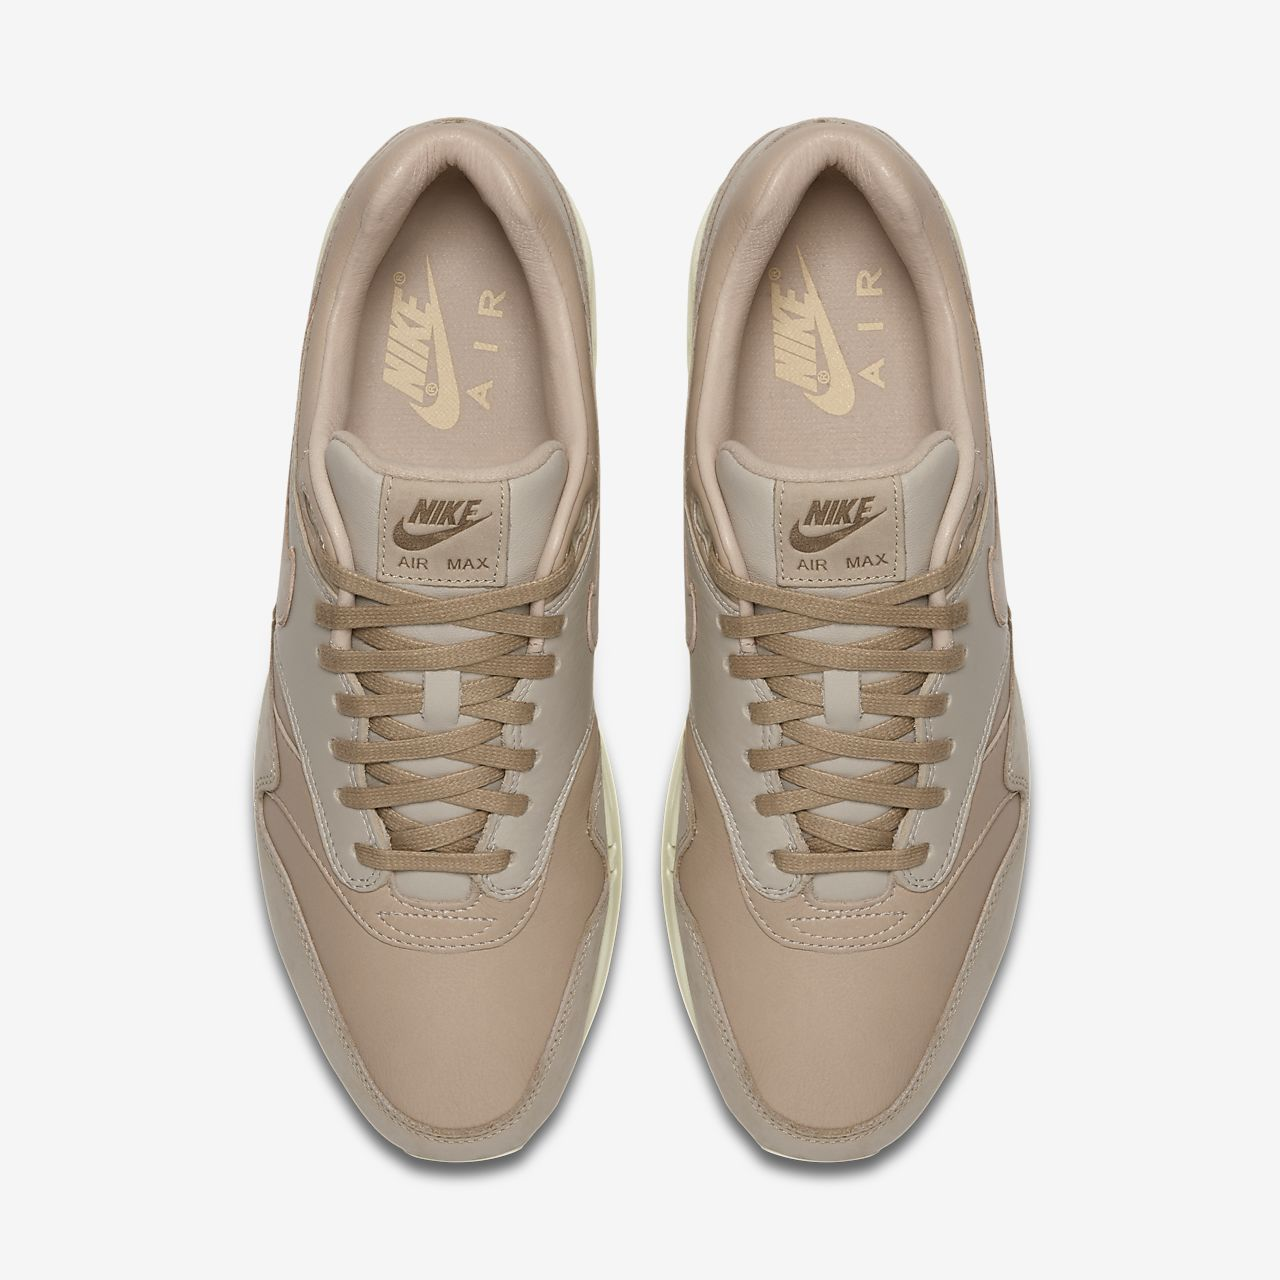 new product 07317 74edd ... Nike Air Max 1 Pinnacle Men s Shoe